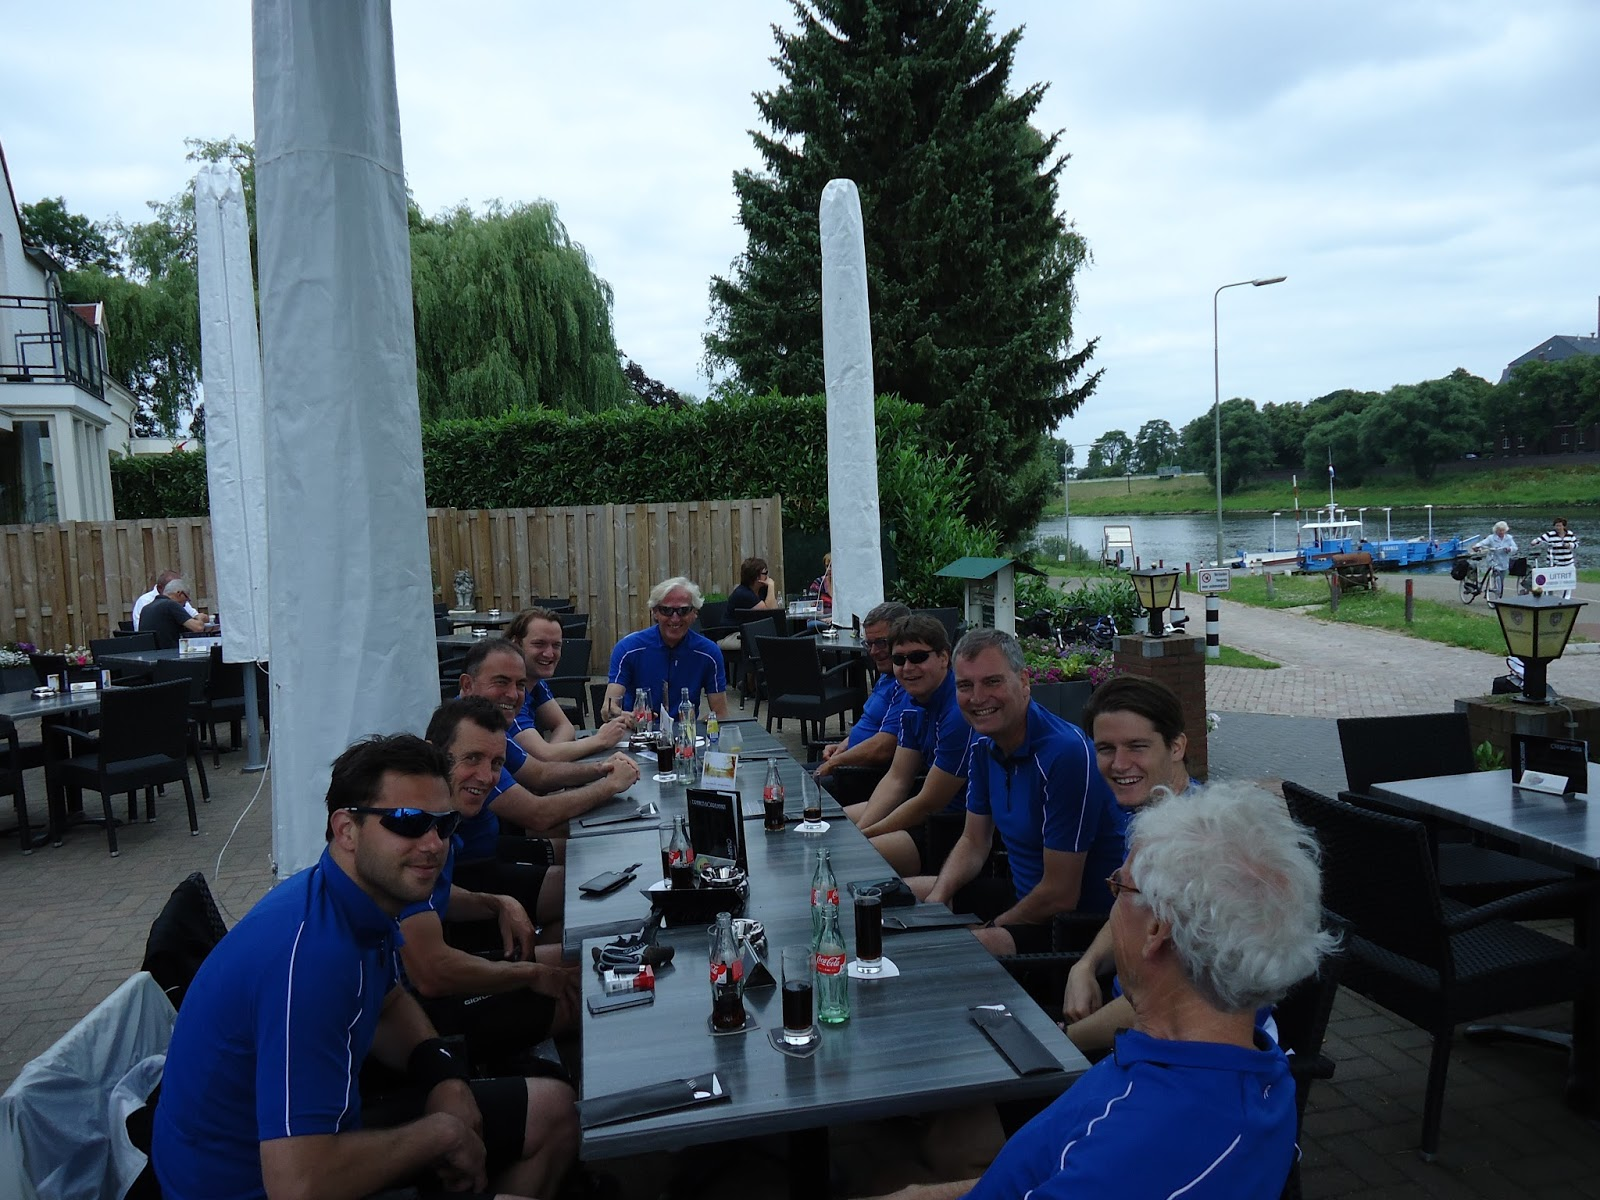 Fietsen 2013: Veldhoven - Praag: Eerste etappe (donderdag ...